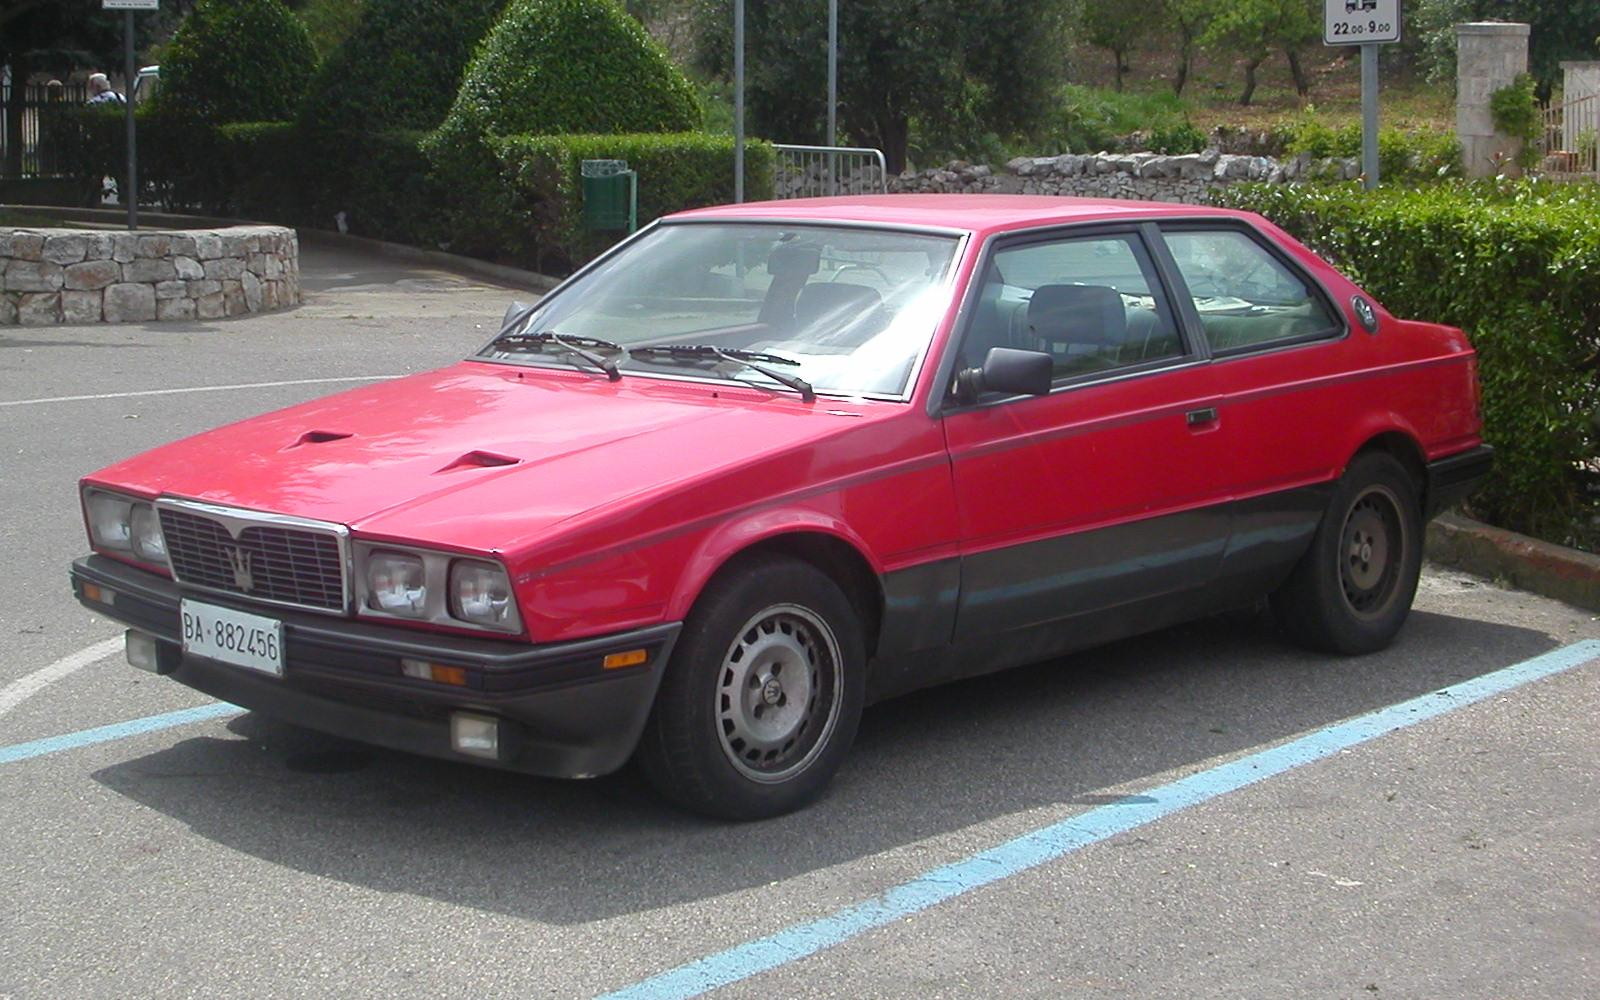 File:Maserati BiTurbo S.JPG